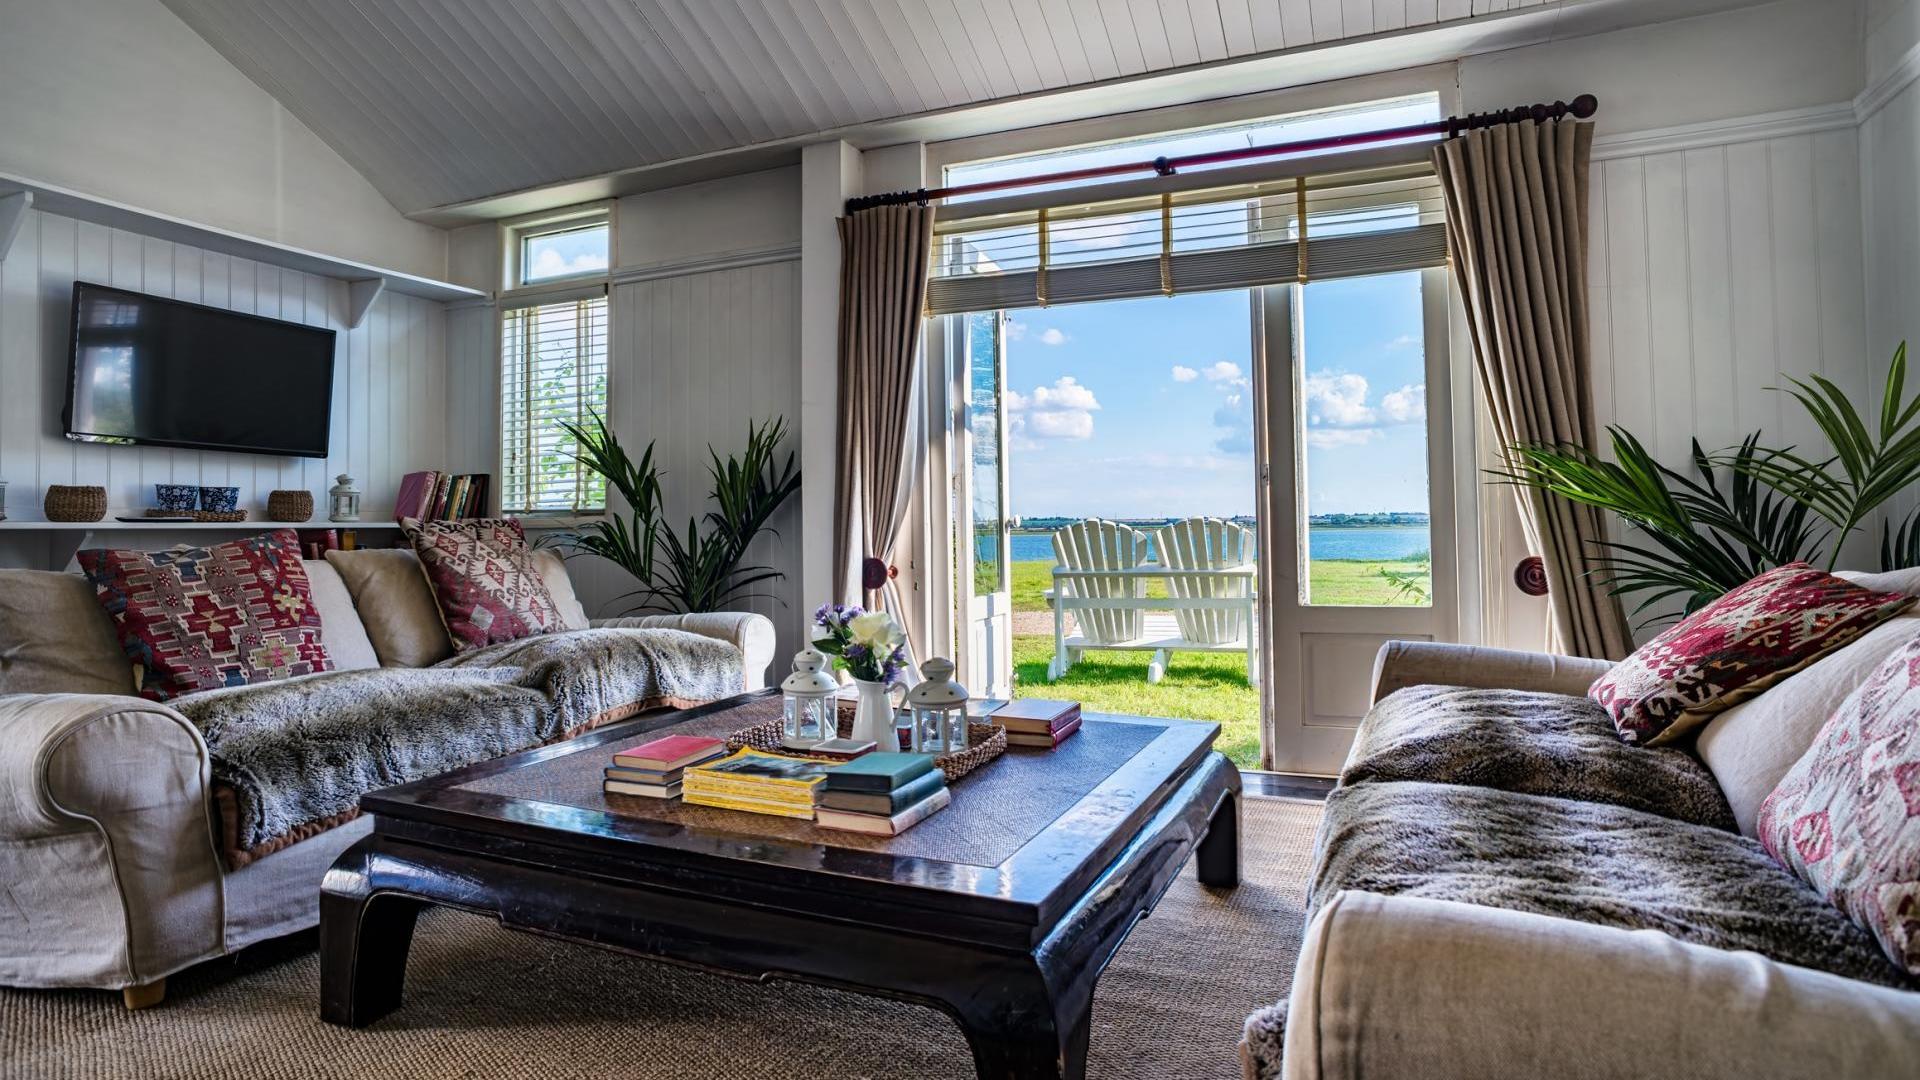 6 Bedroom Beach cottage in Essex, United Kingdom